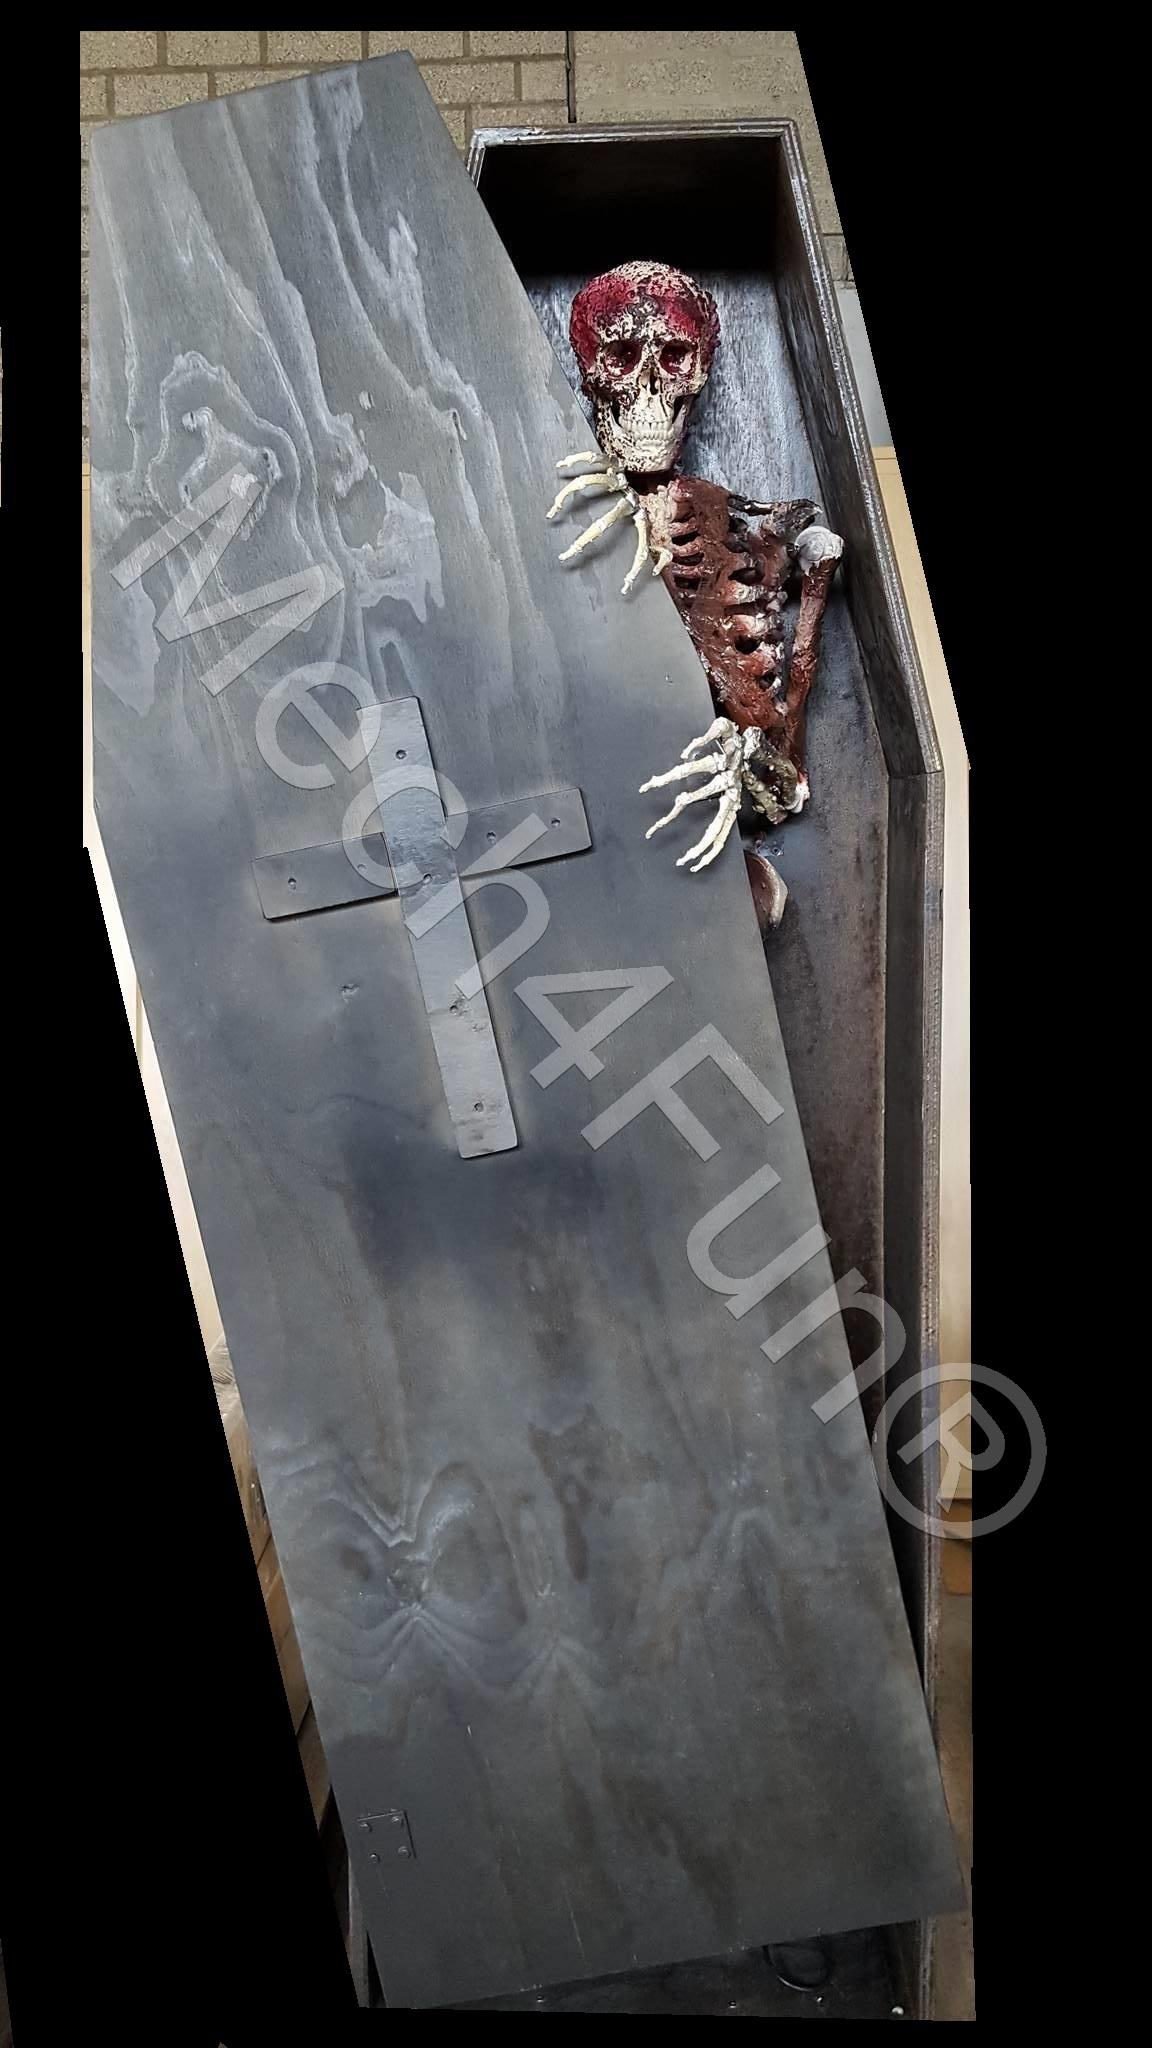 Mech4Fun Coffin for sale